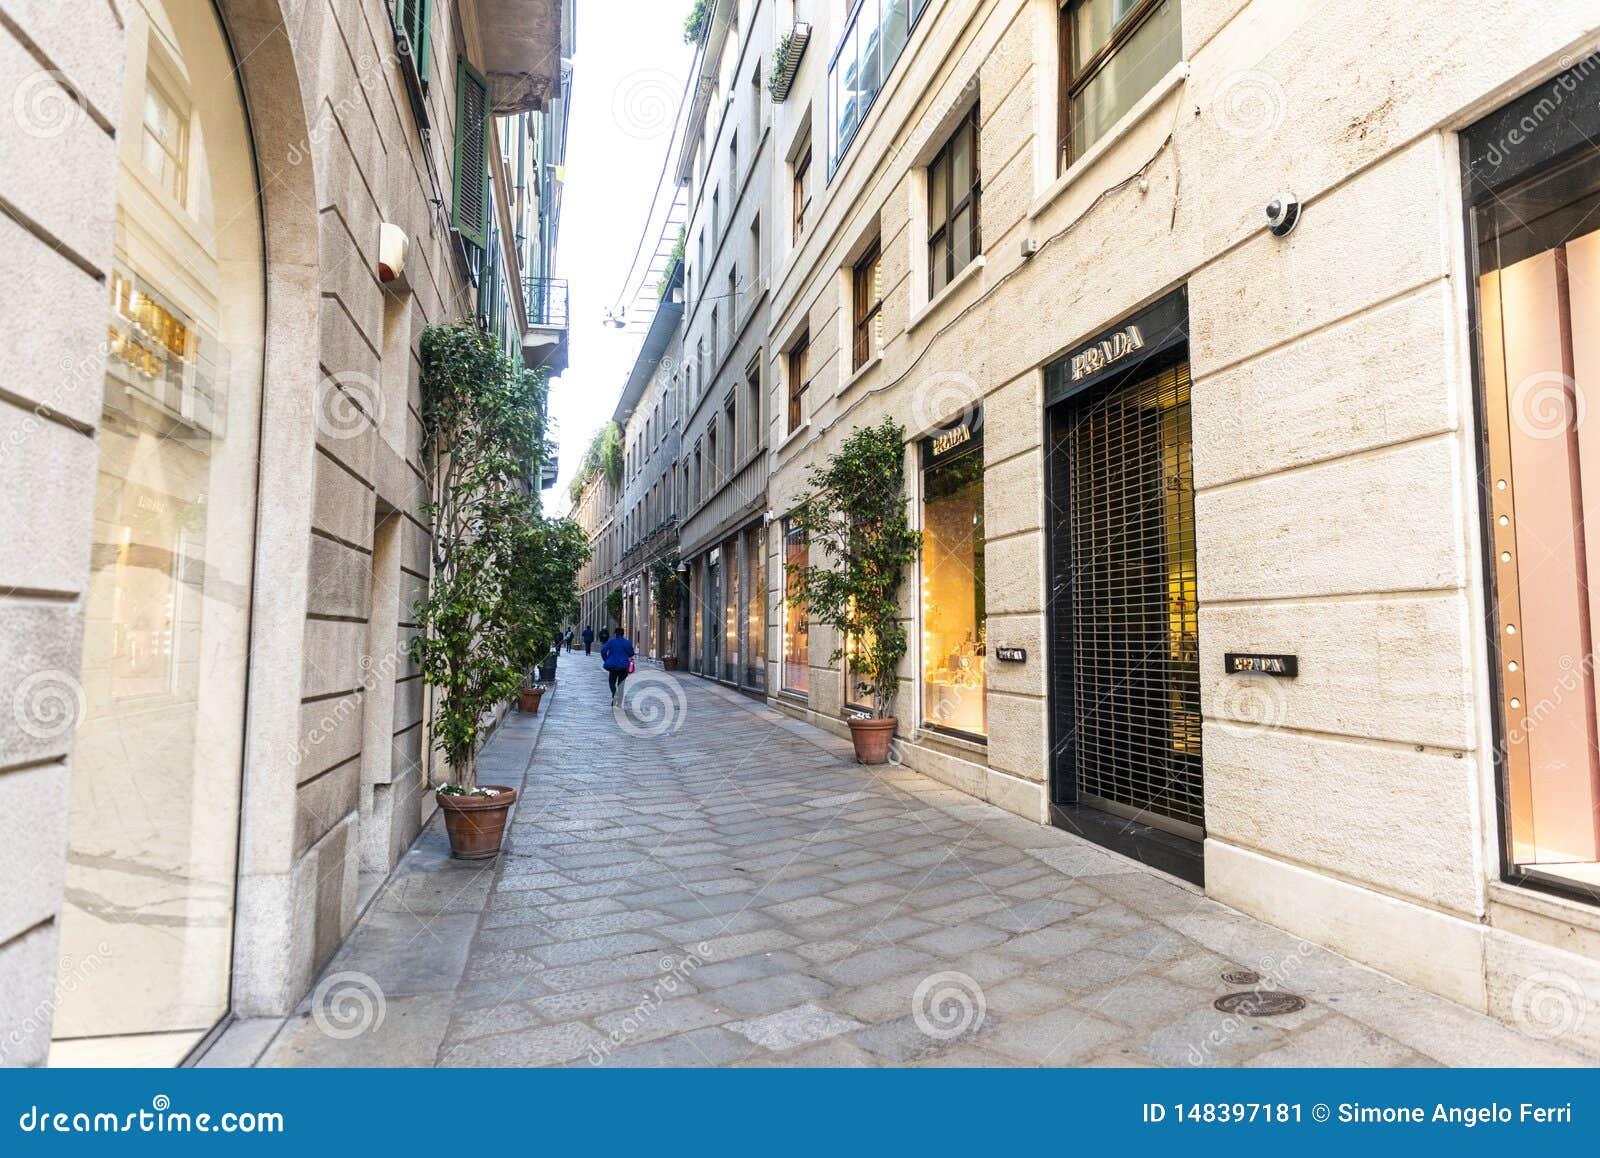 Della Spiga luksusu i zakupy ulica w centrum Mediolan